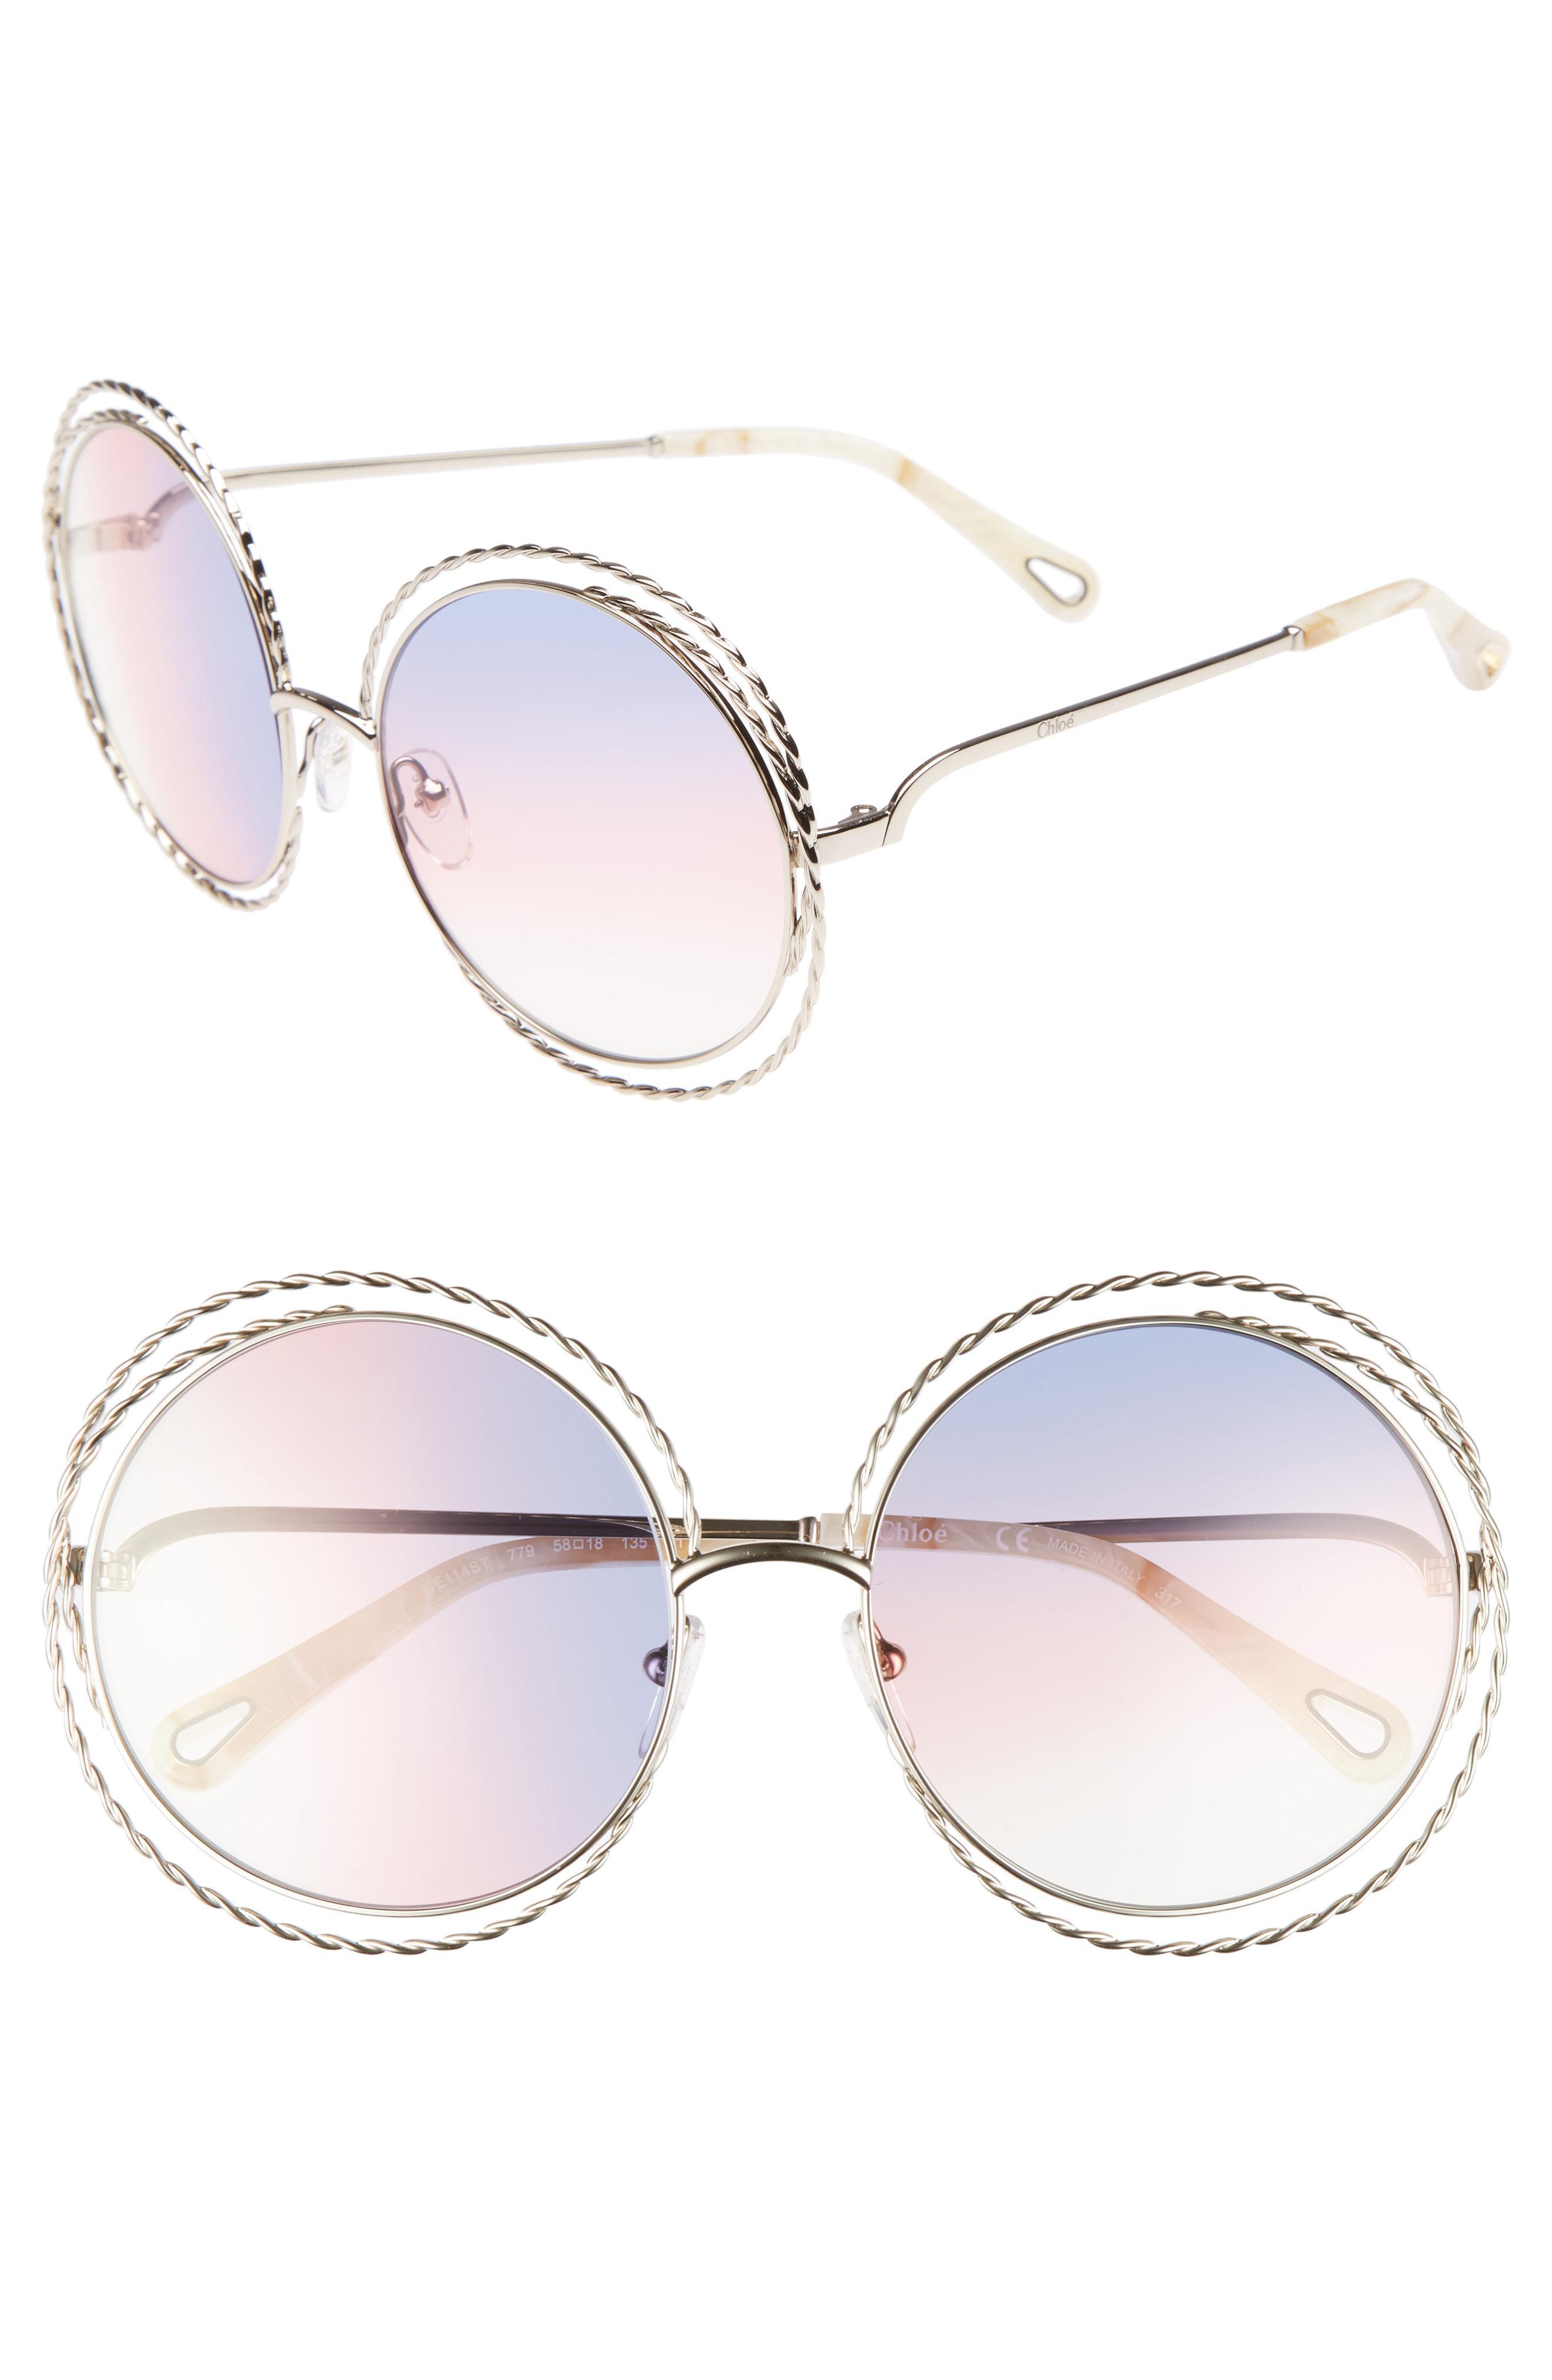 a933eb531d3 Lyst - Chloé Carlina Torsade 58mm Round Sunglasses in Metallic